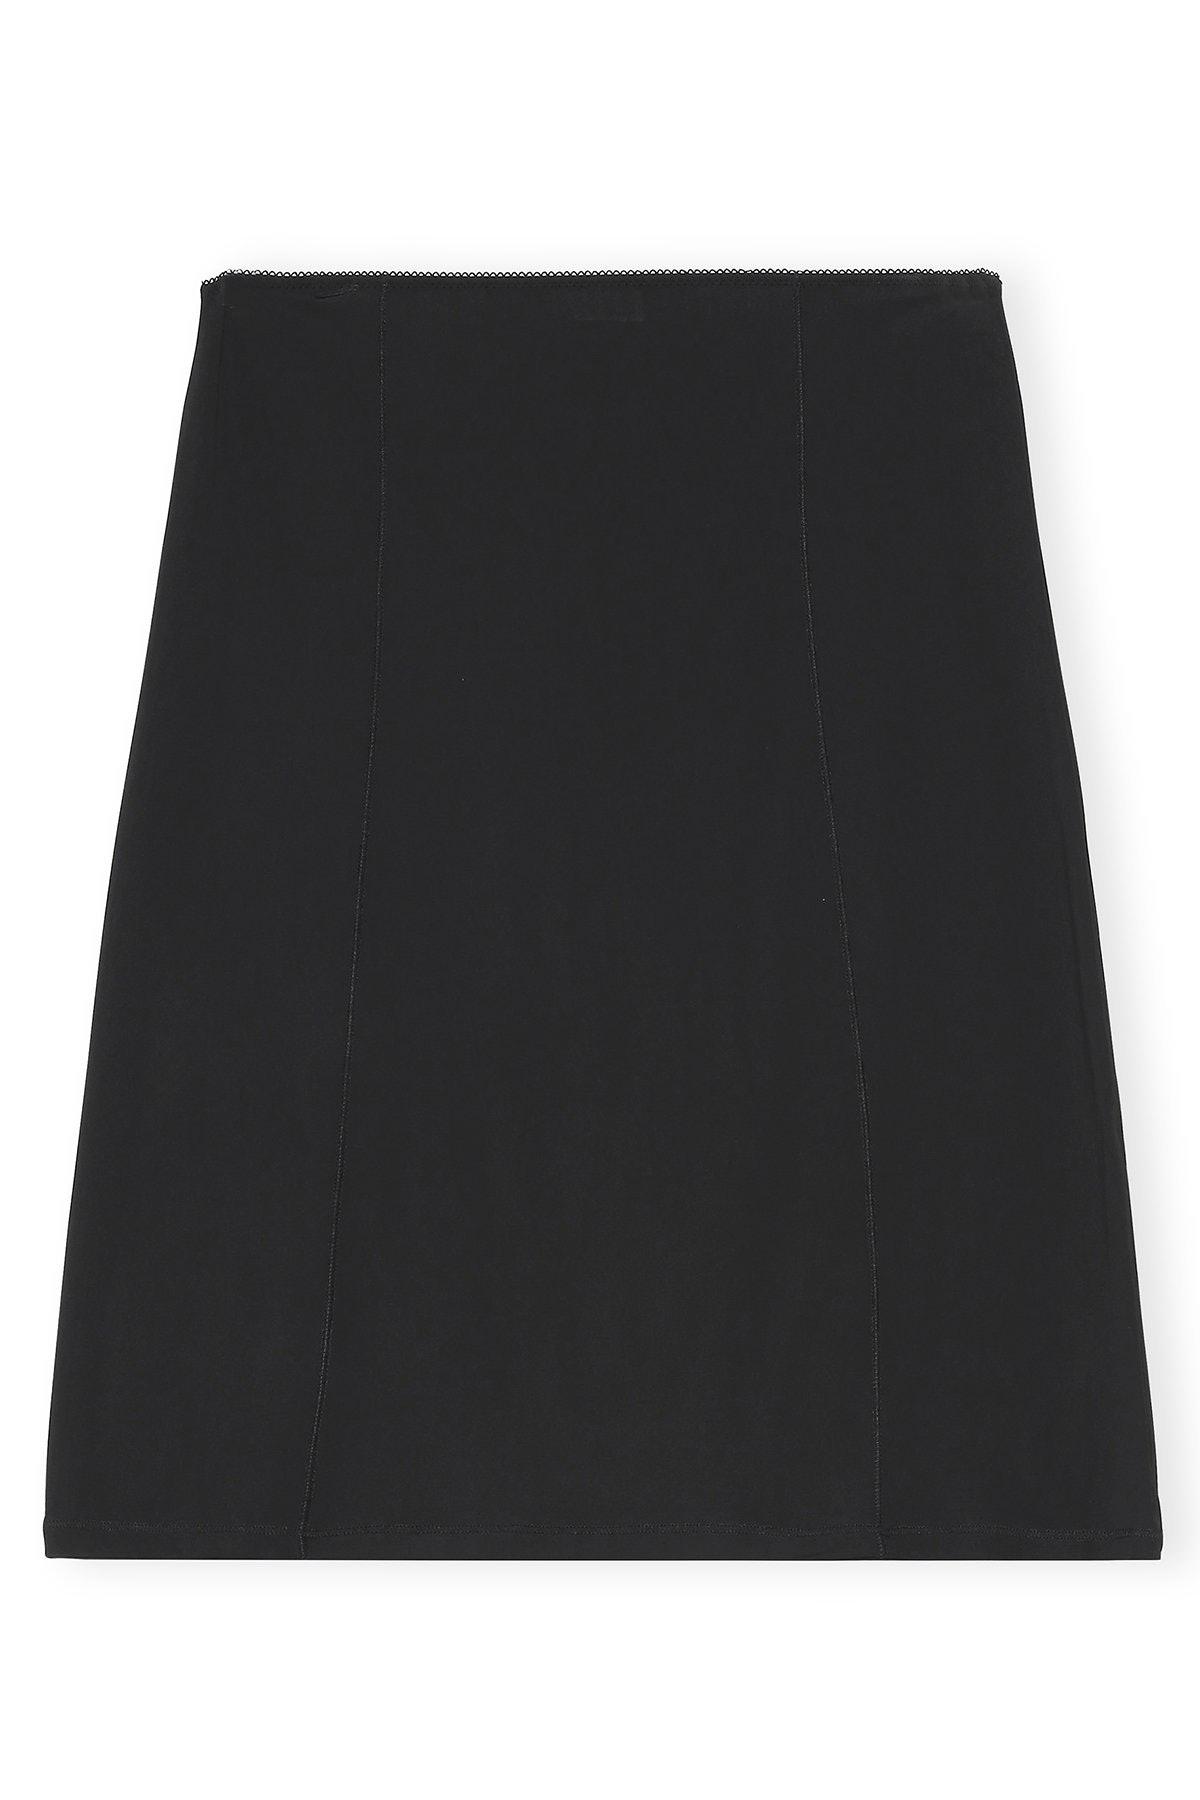 Rayon Slip Skirt in Black: image 1